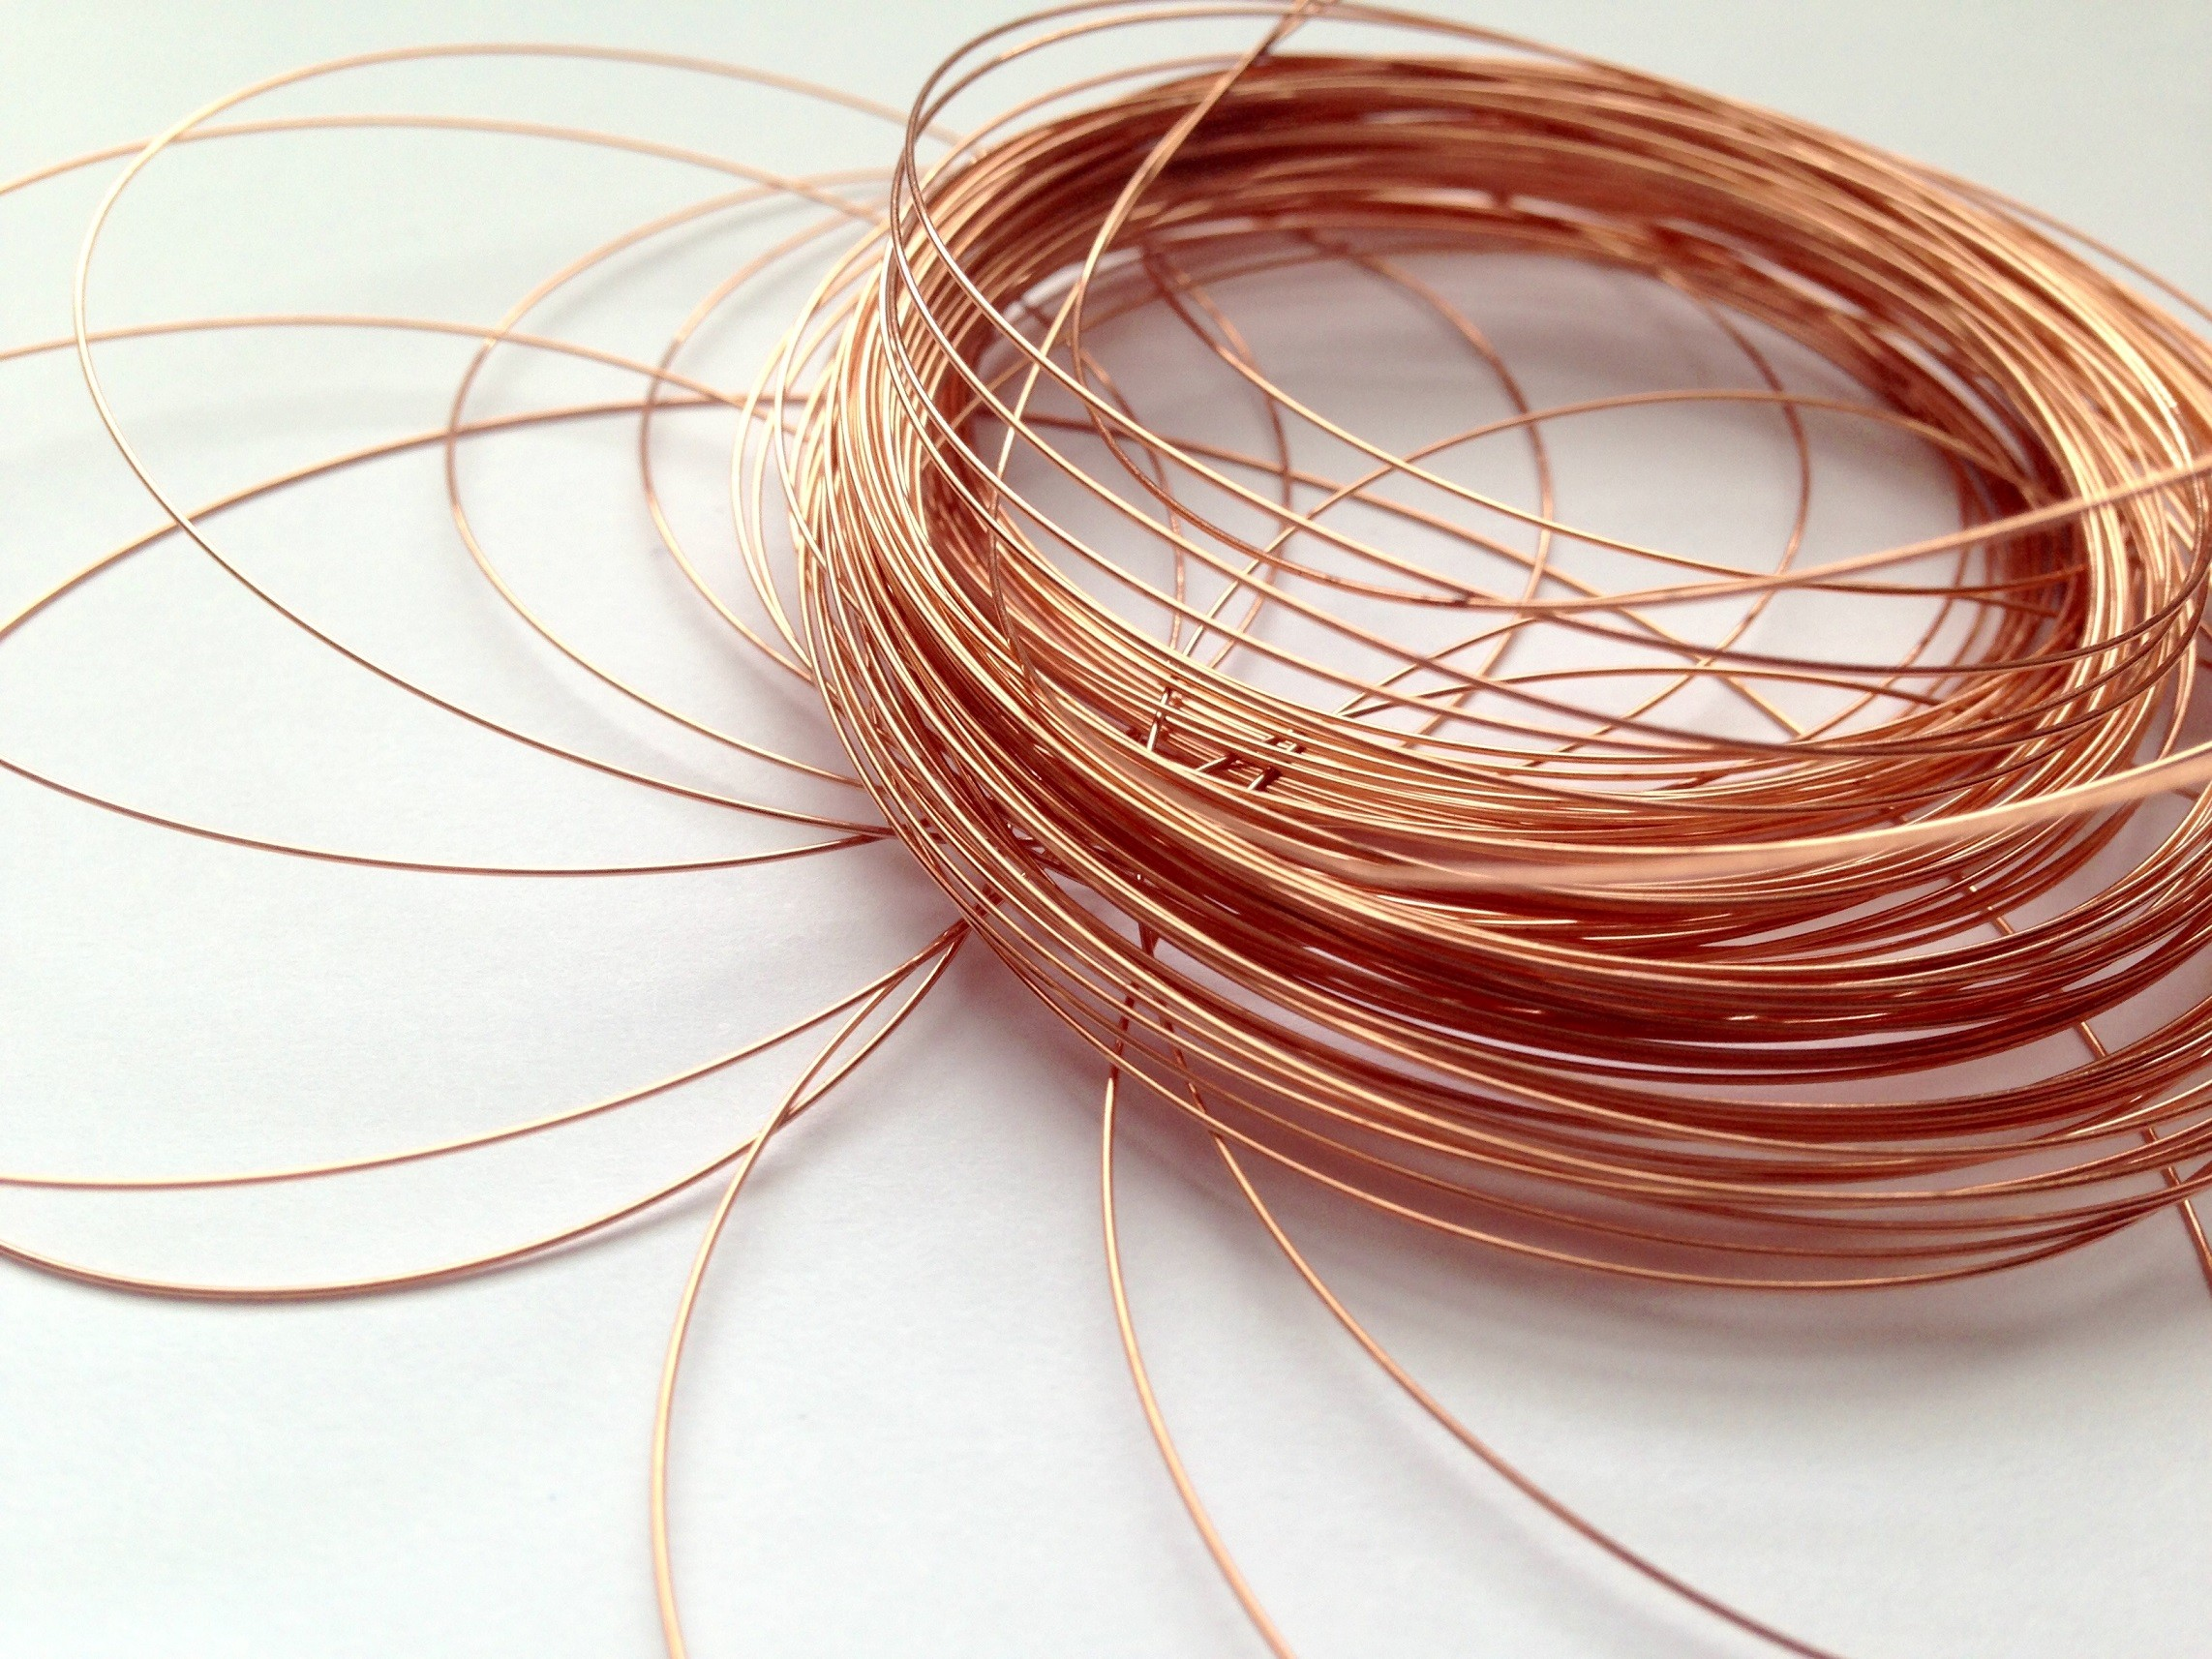 Copper wire coil on white background